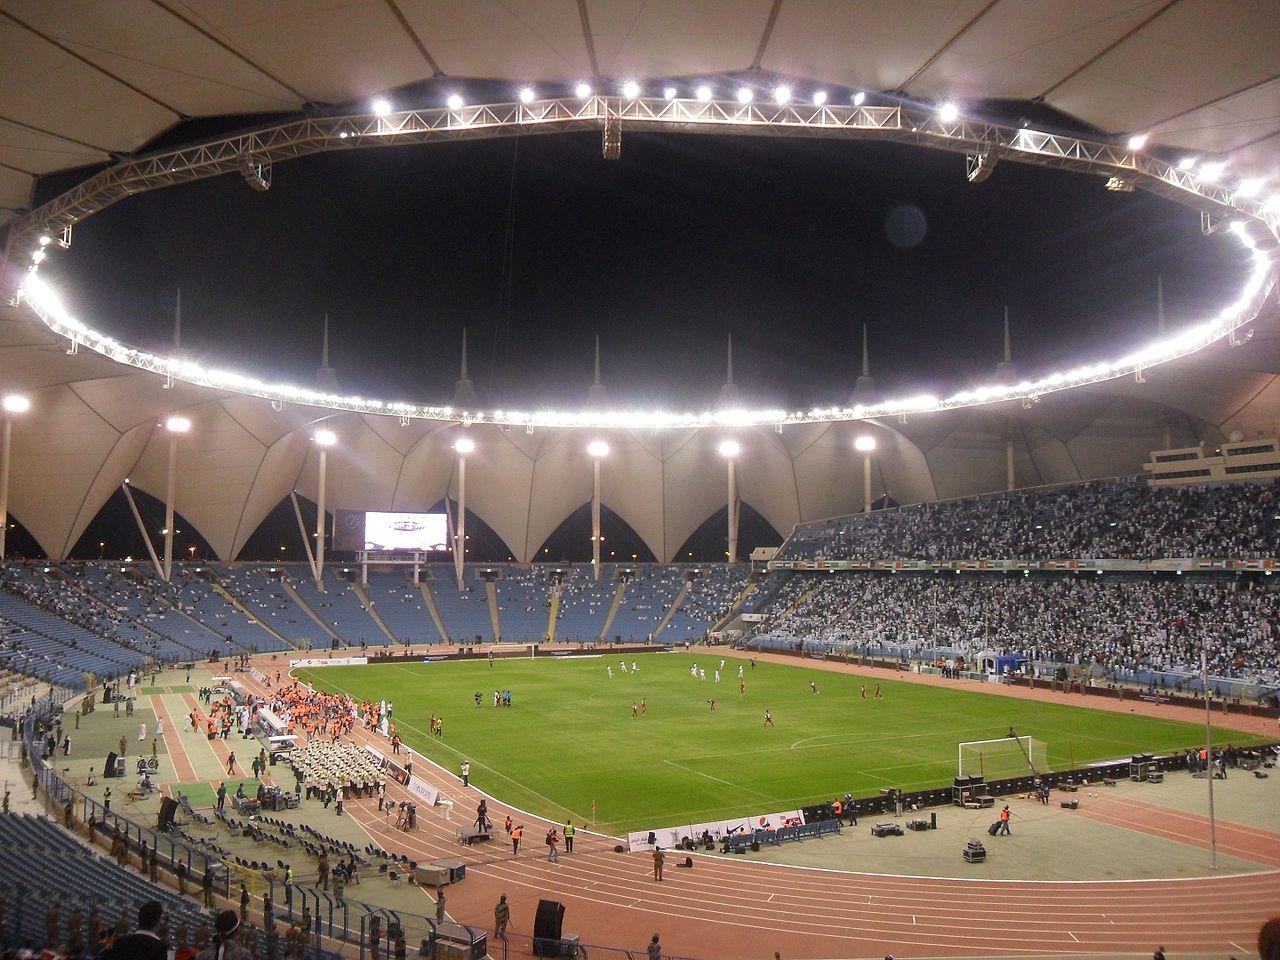 King Fahd International Stadium in India